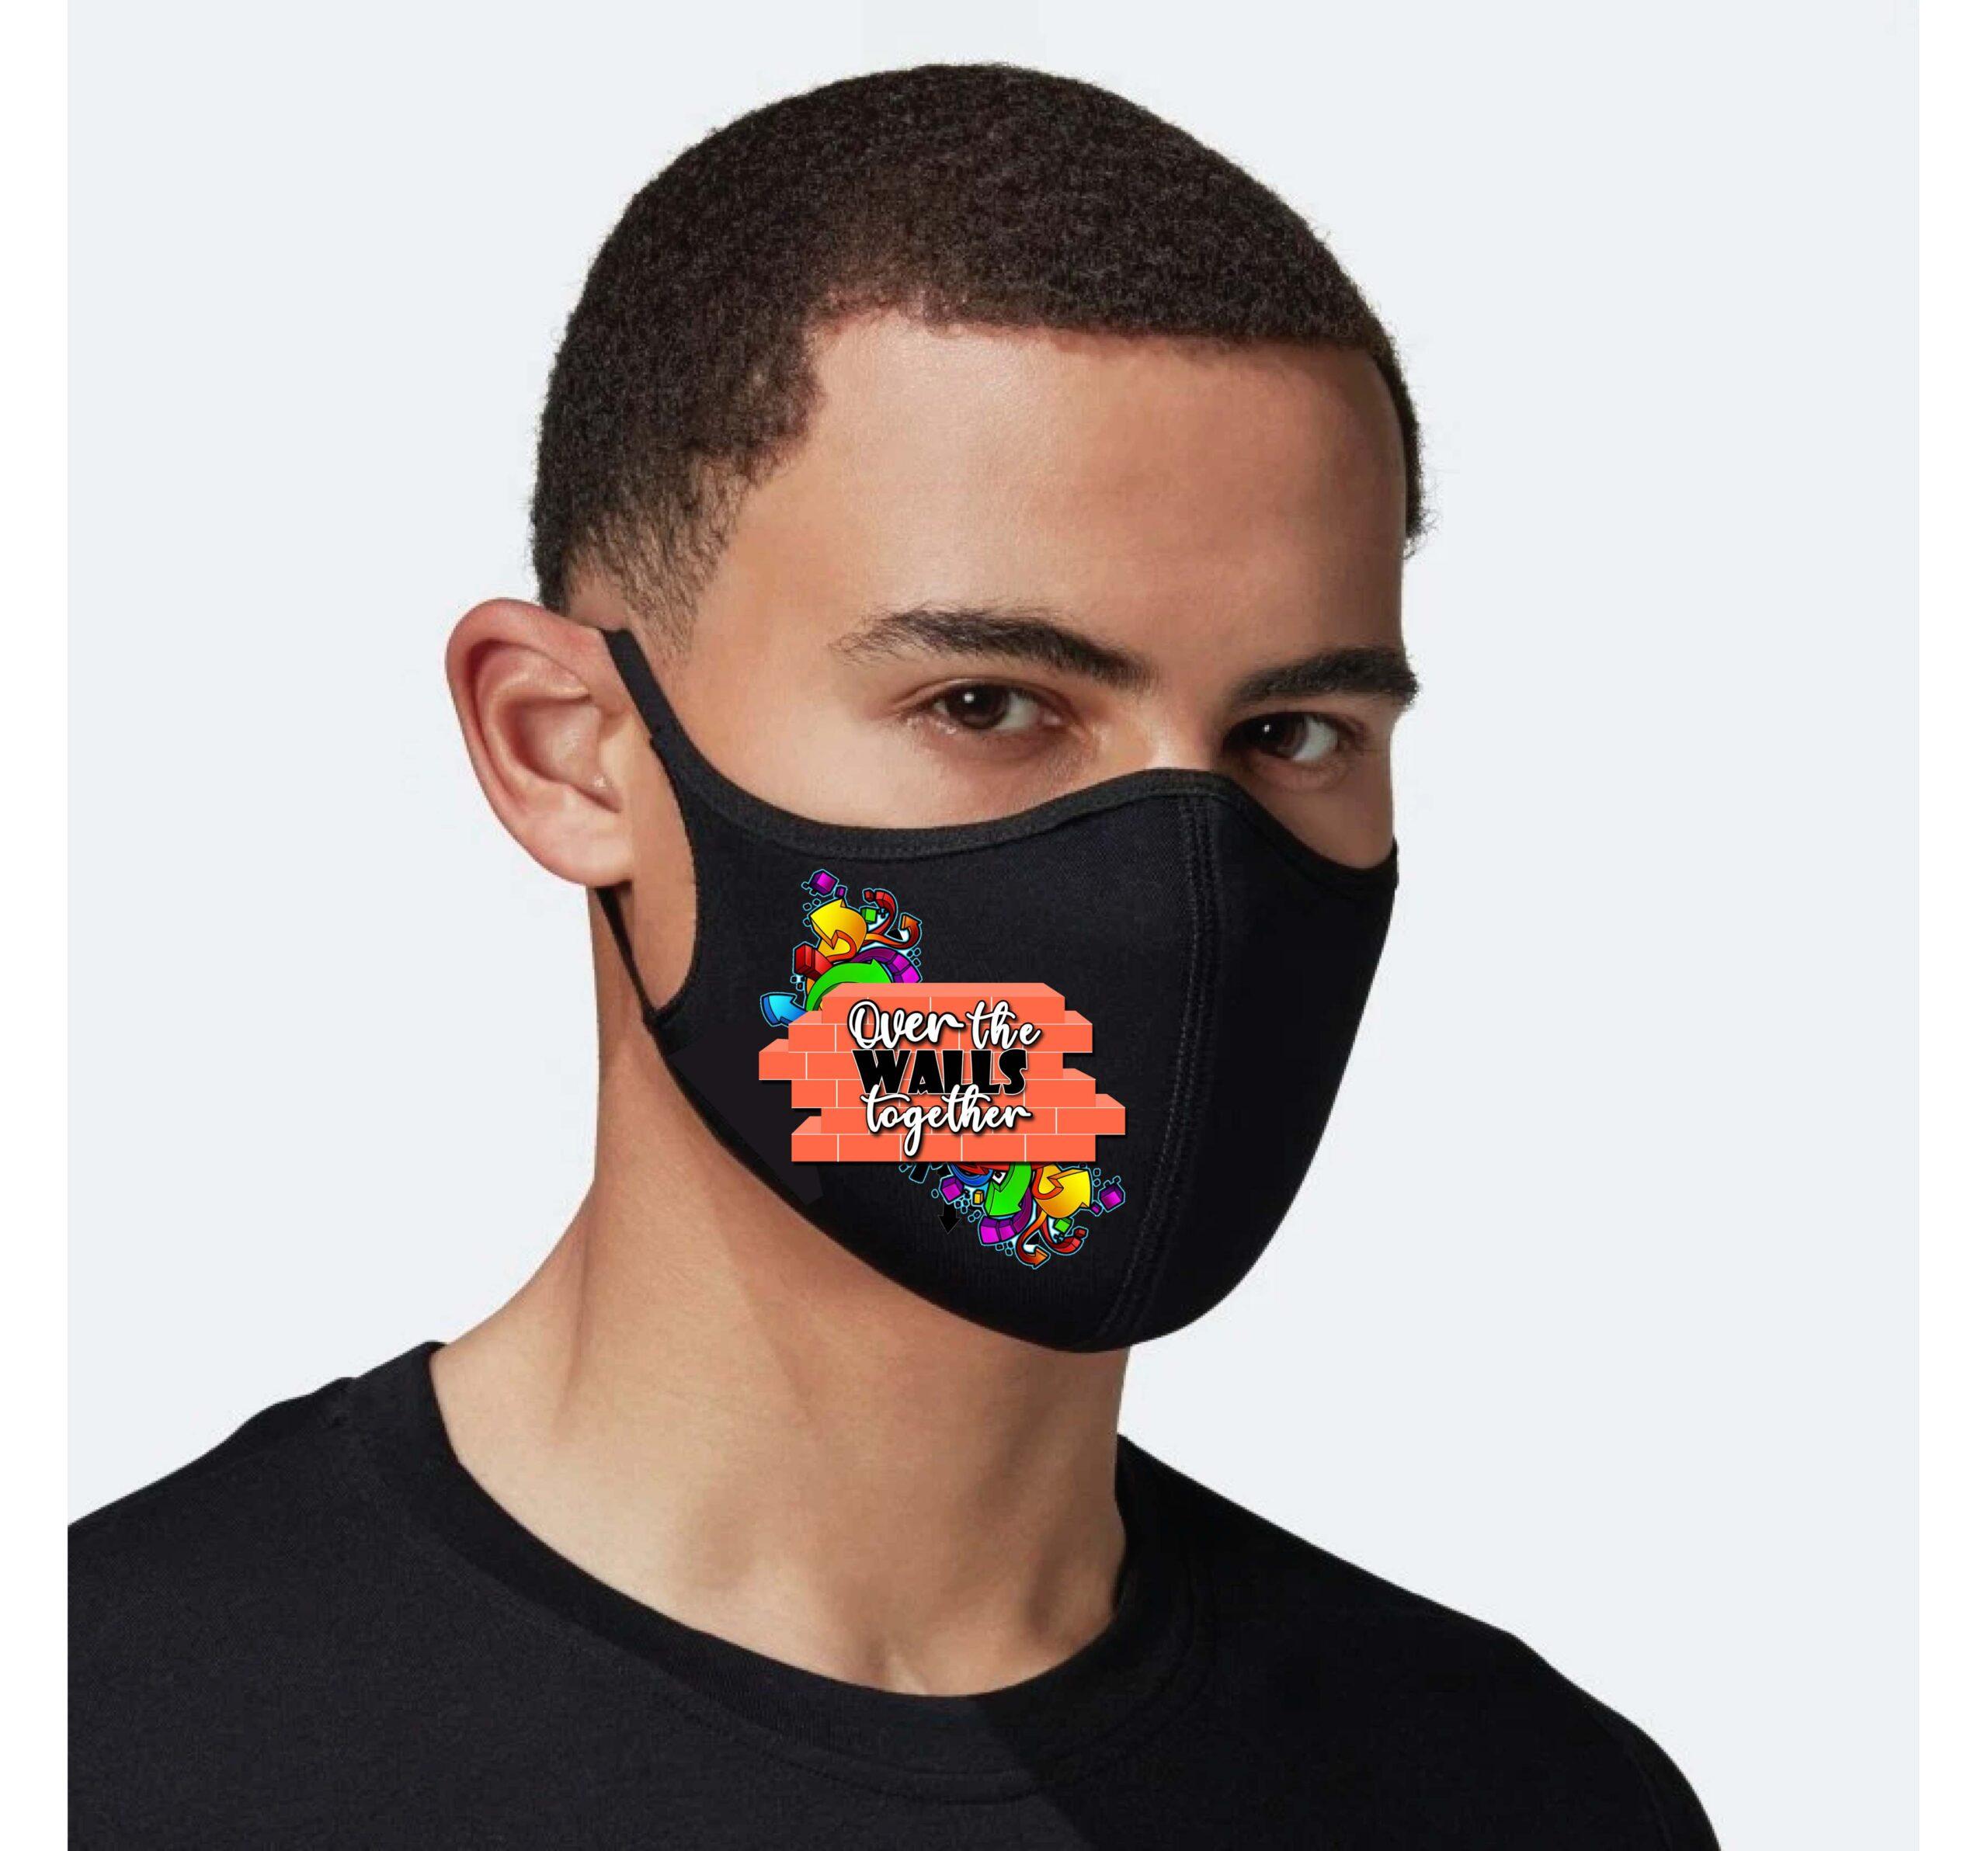 otwt-mask-design1